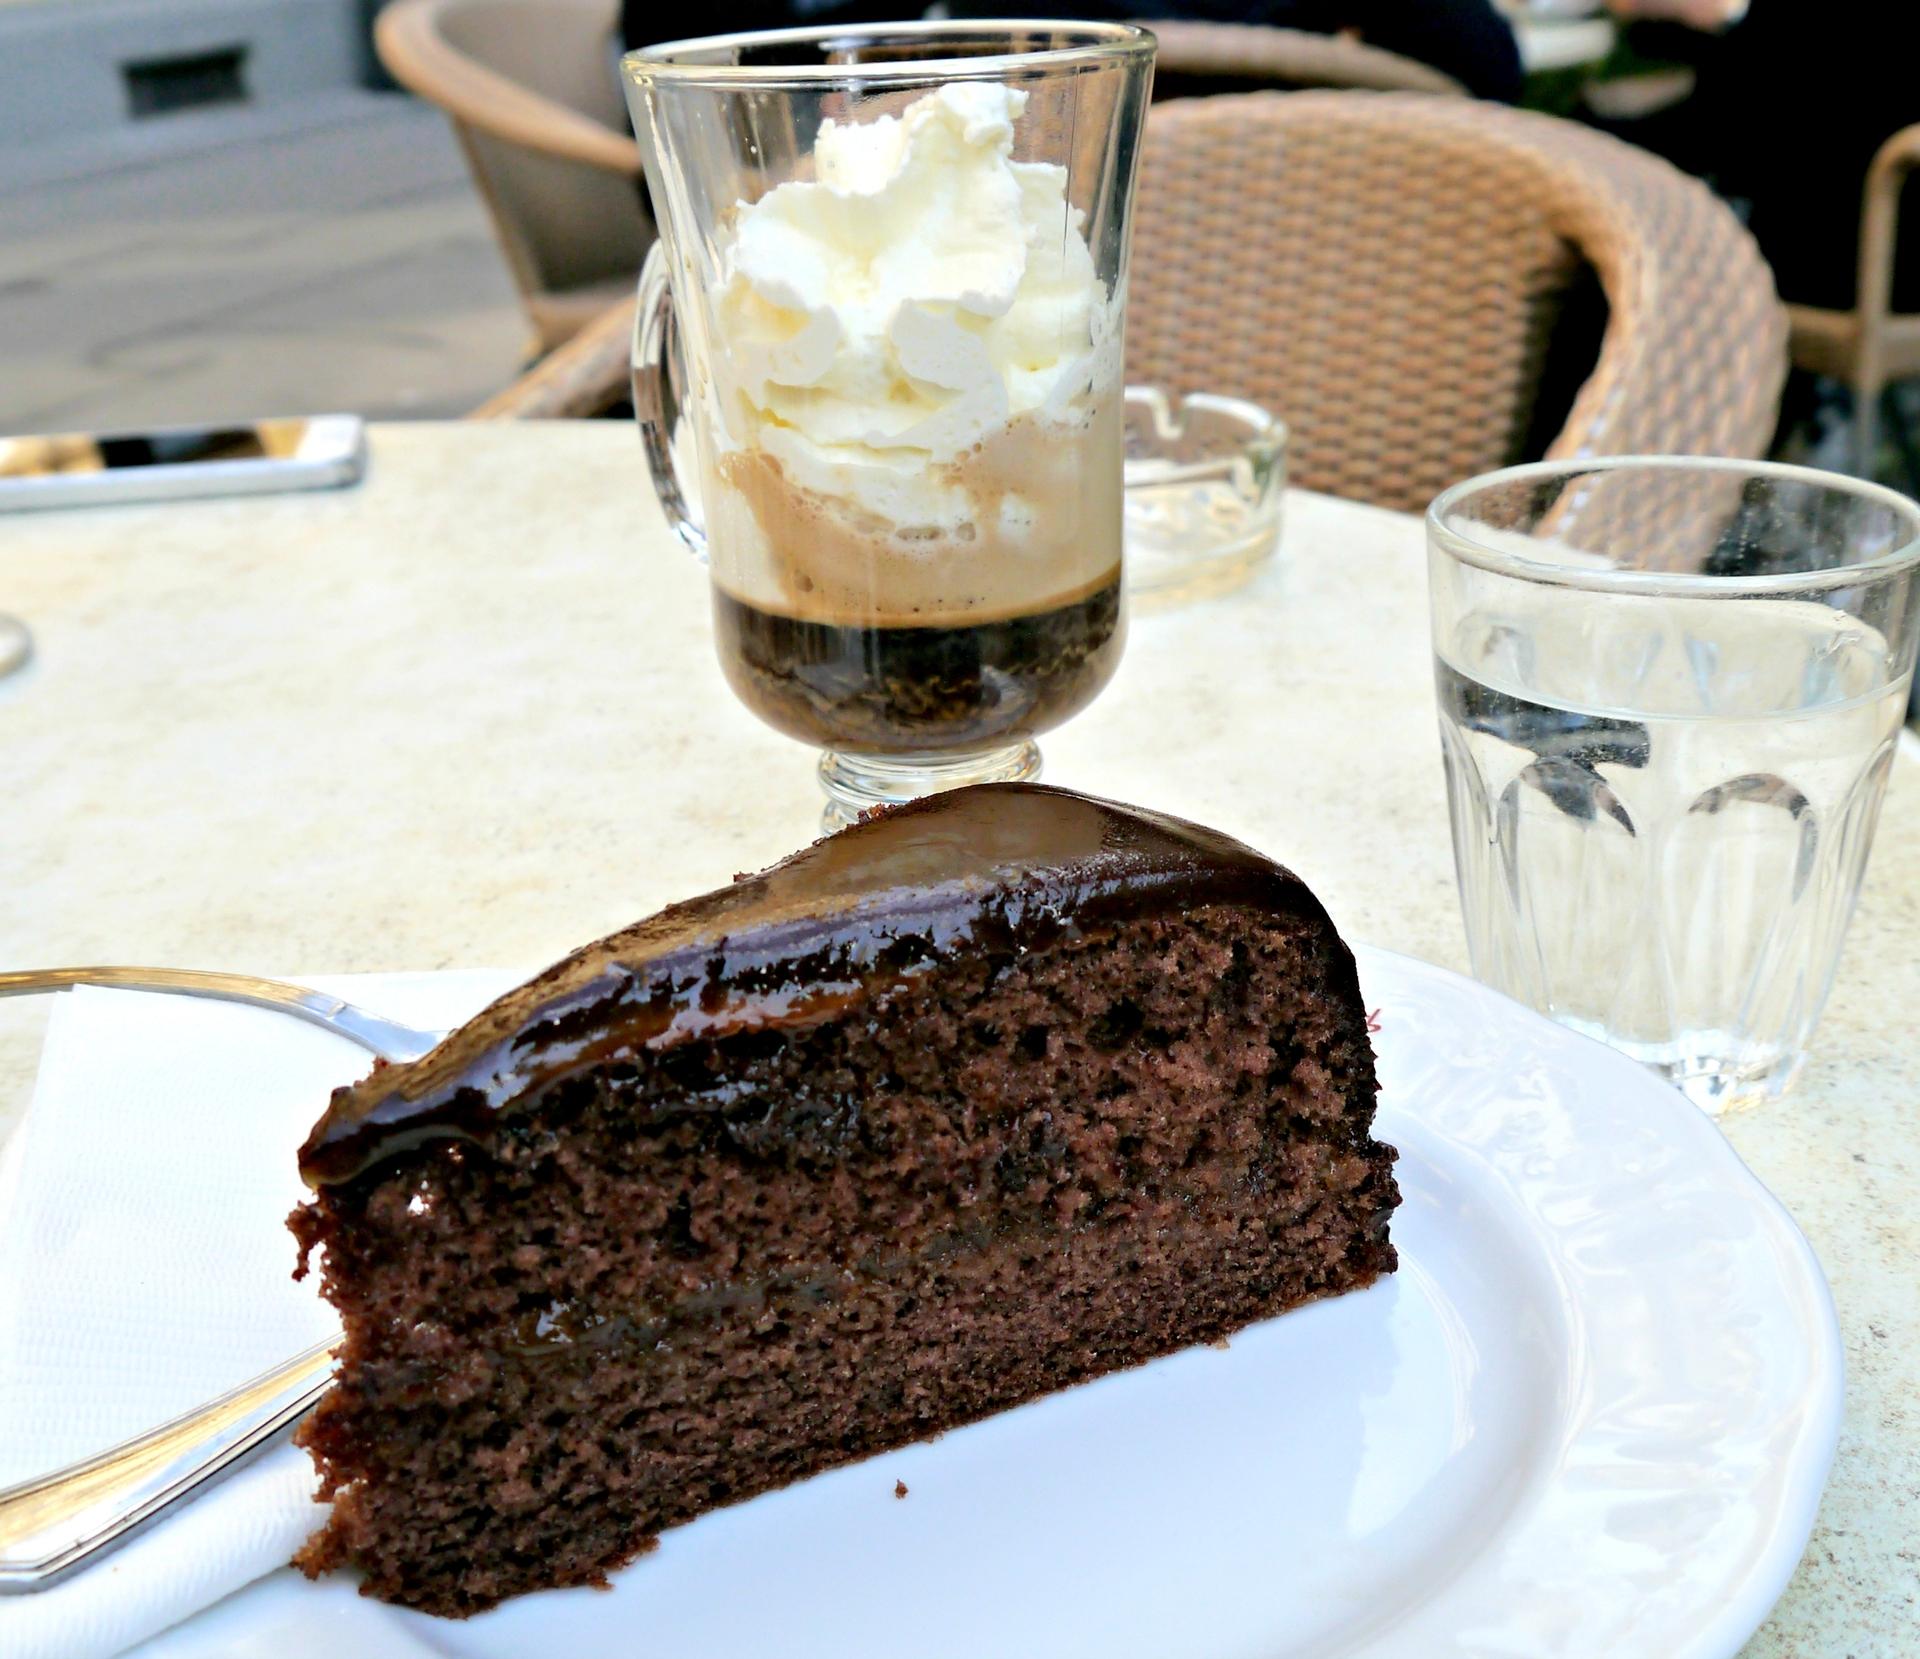 Sacher Torte from Cafe Sperl. Vienna, Austria. September 2015